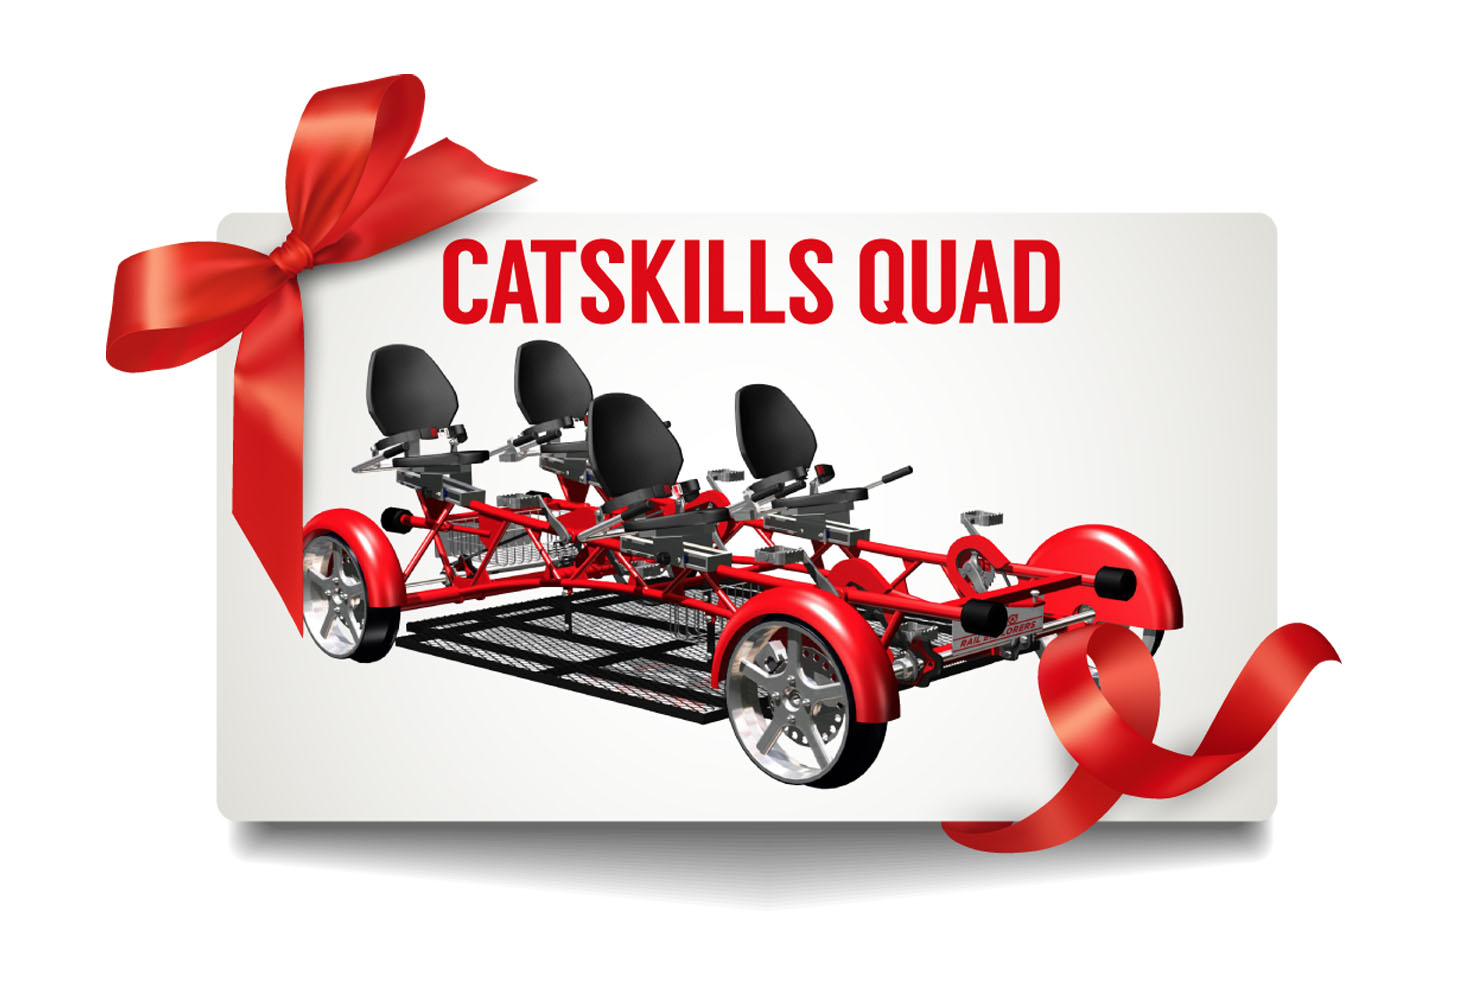 Gift Card: Catskills Weekend Quad $175